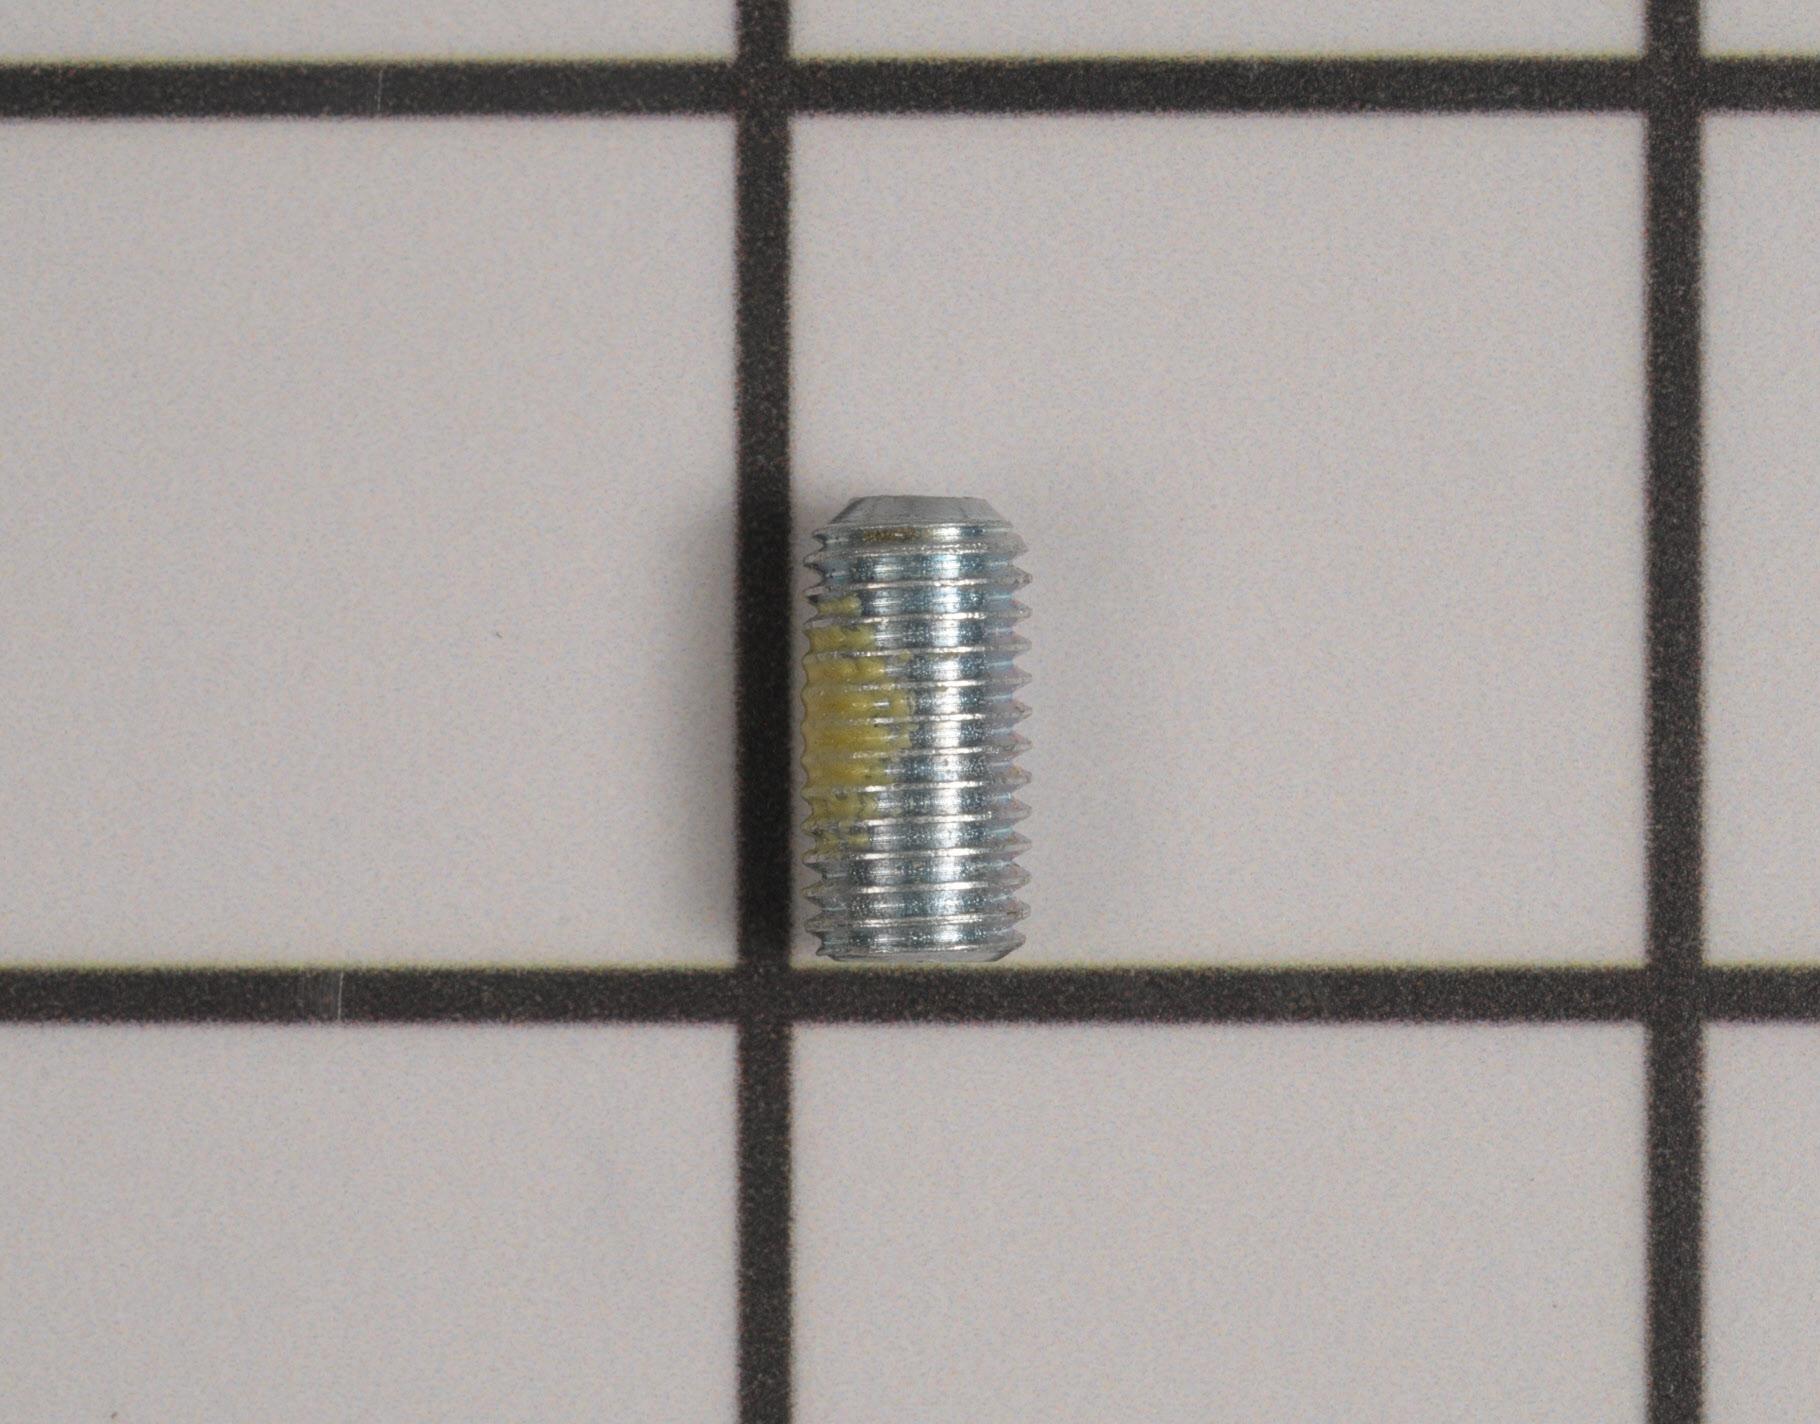 22001423 Jenn Air Washing Machine Part -Set Screw